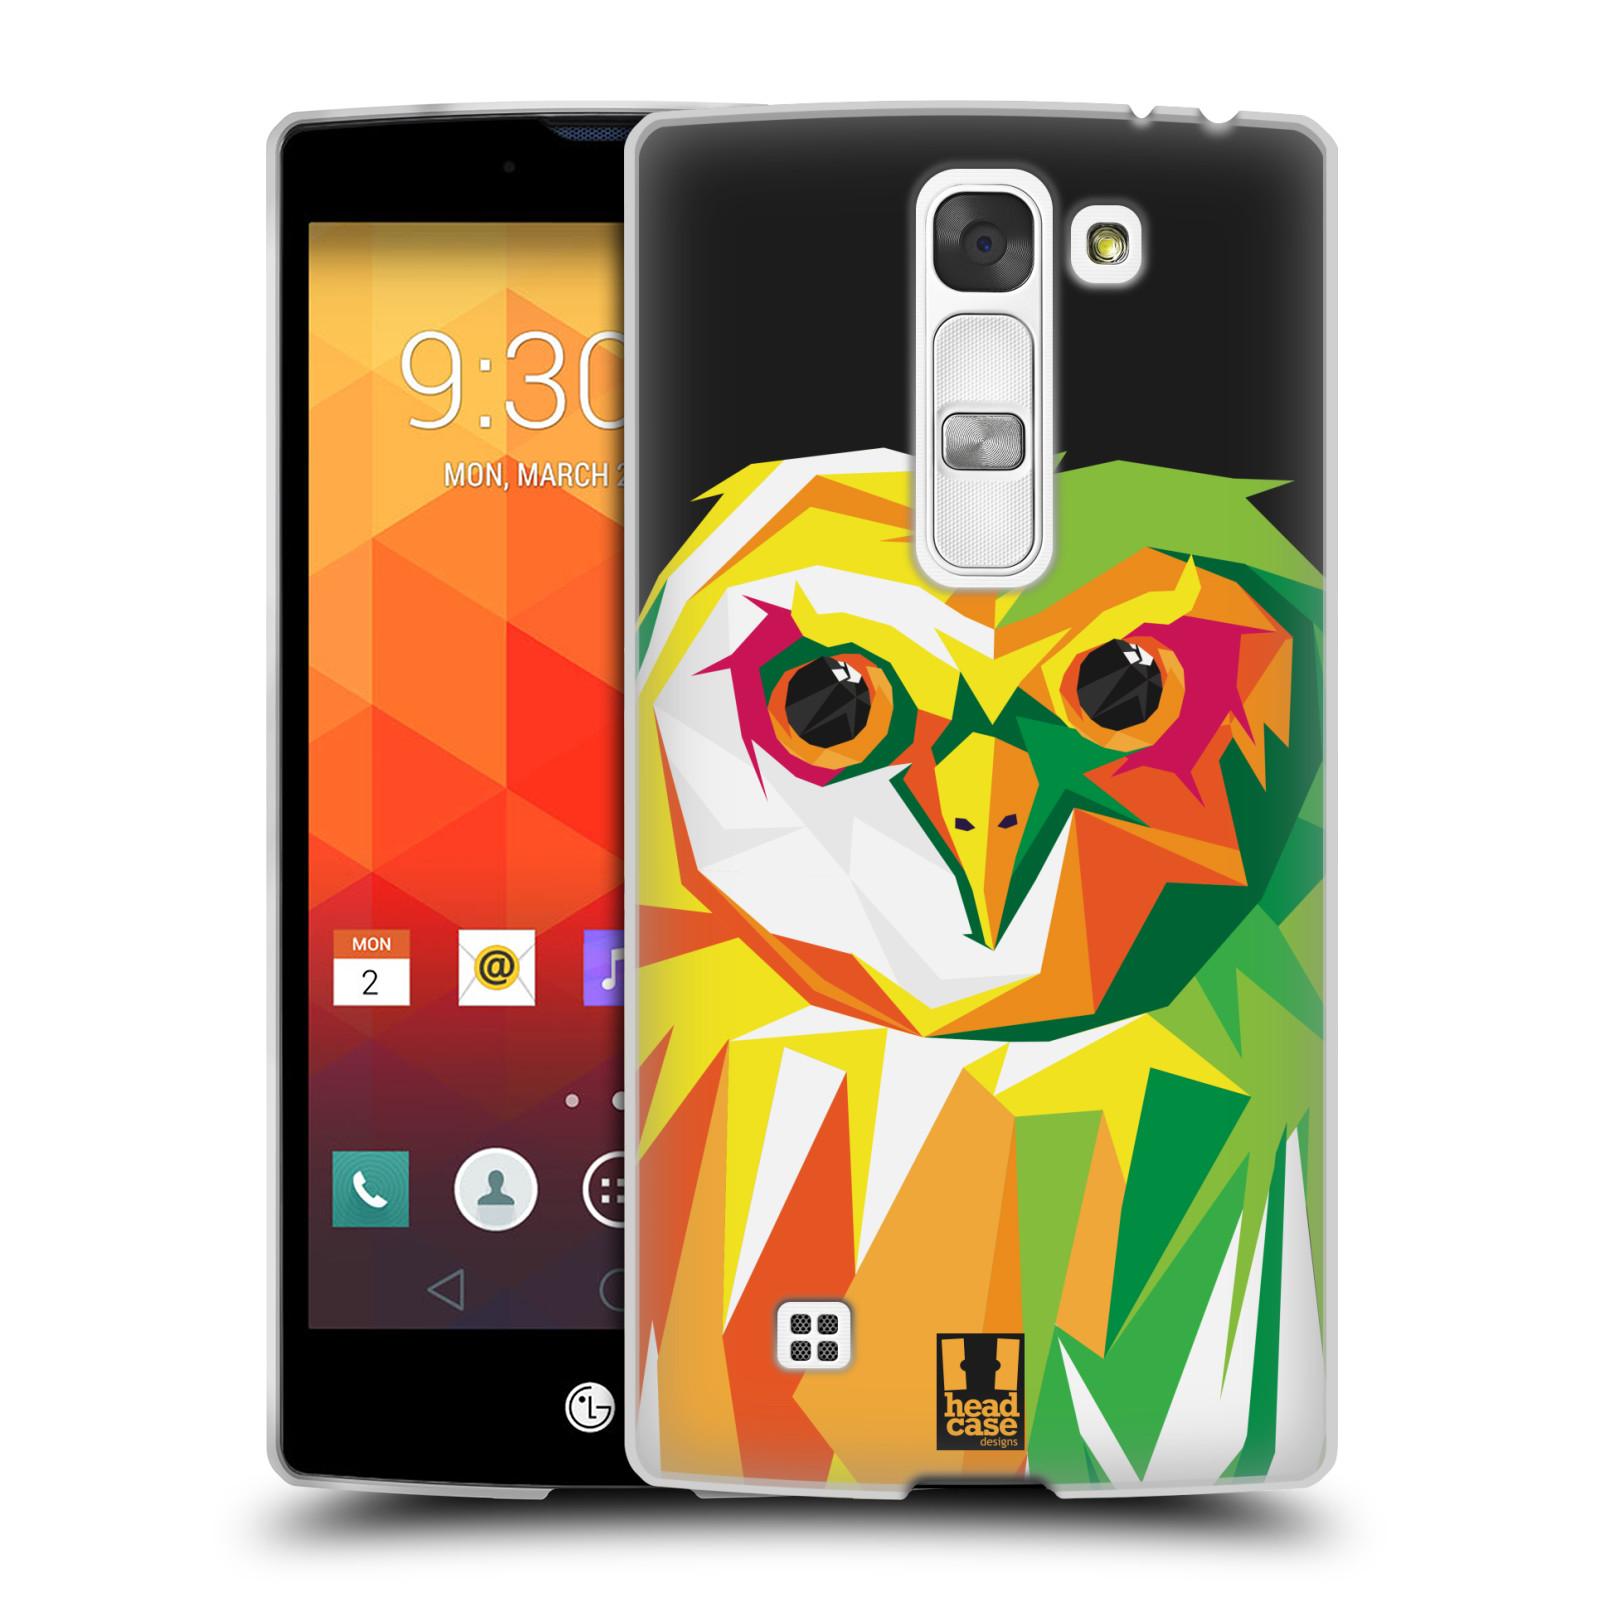 Head Case Designs POP ART Animals Soft GEL Case FOR LG Phones 2 eBay